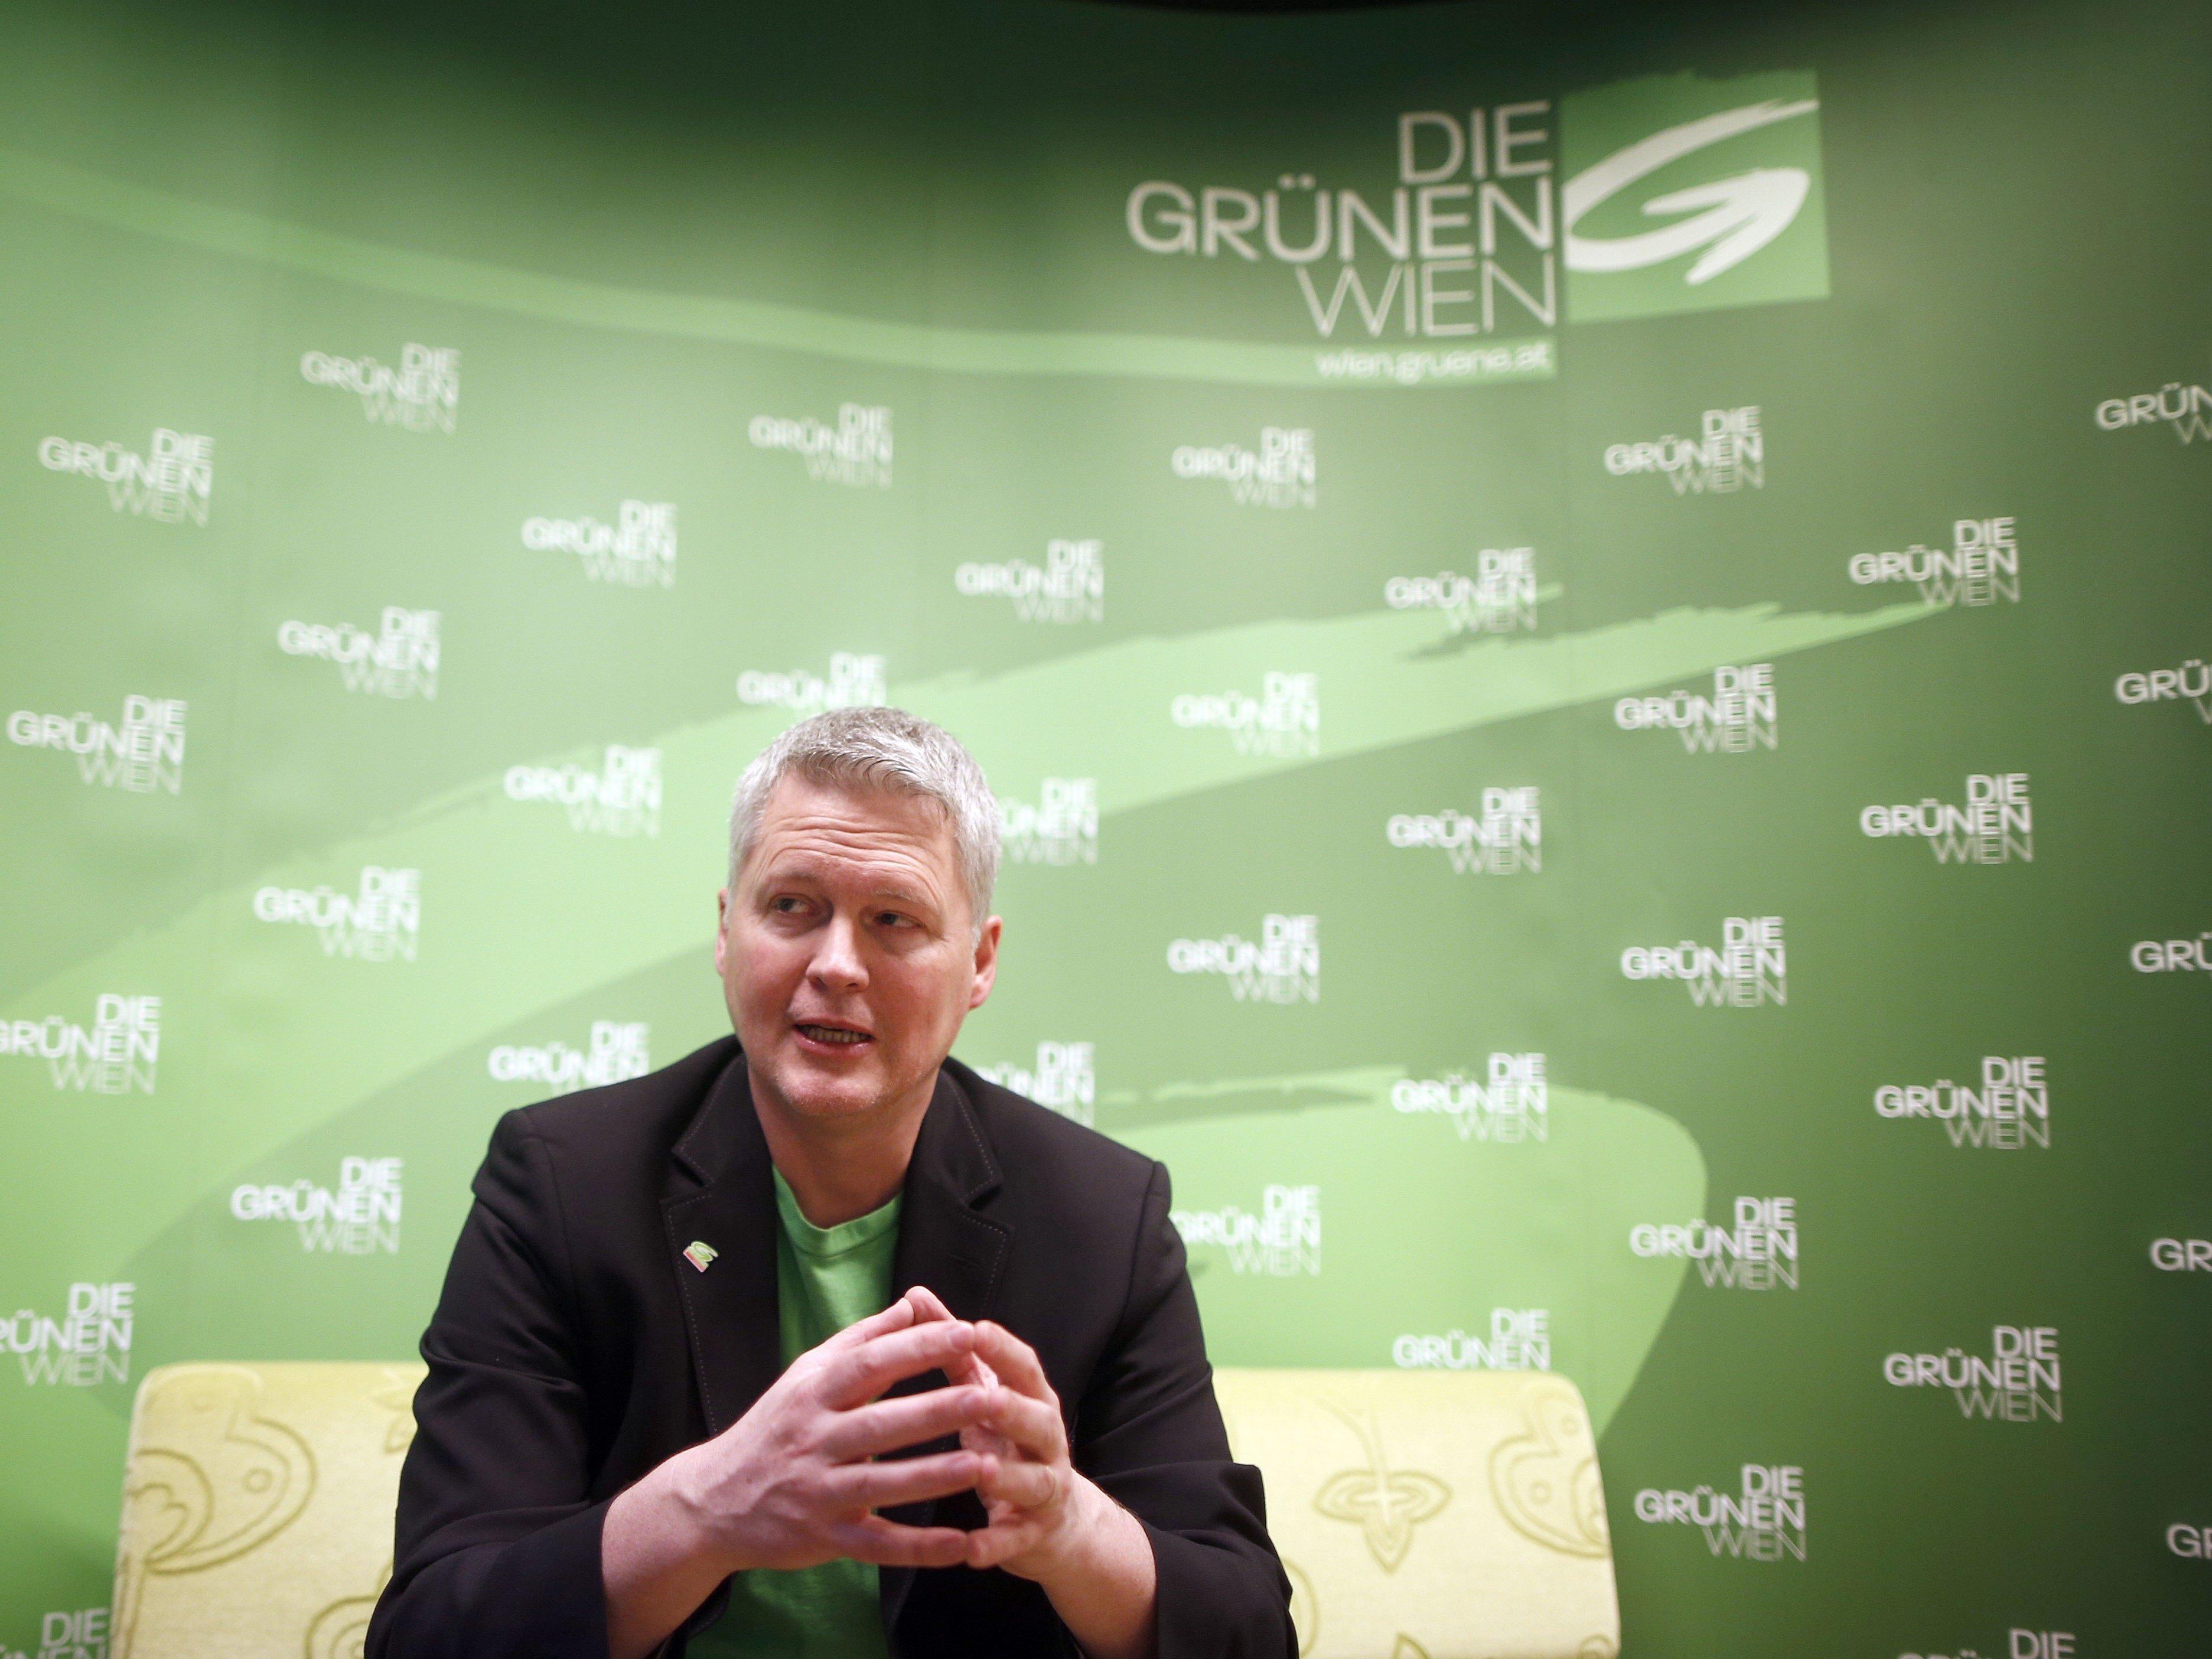 Klubobmann David Ellensohn sprach über die bevorstehende Grünen-Klubklausur